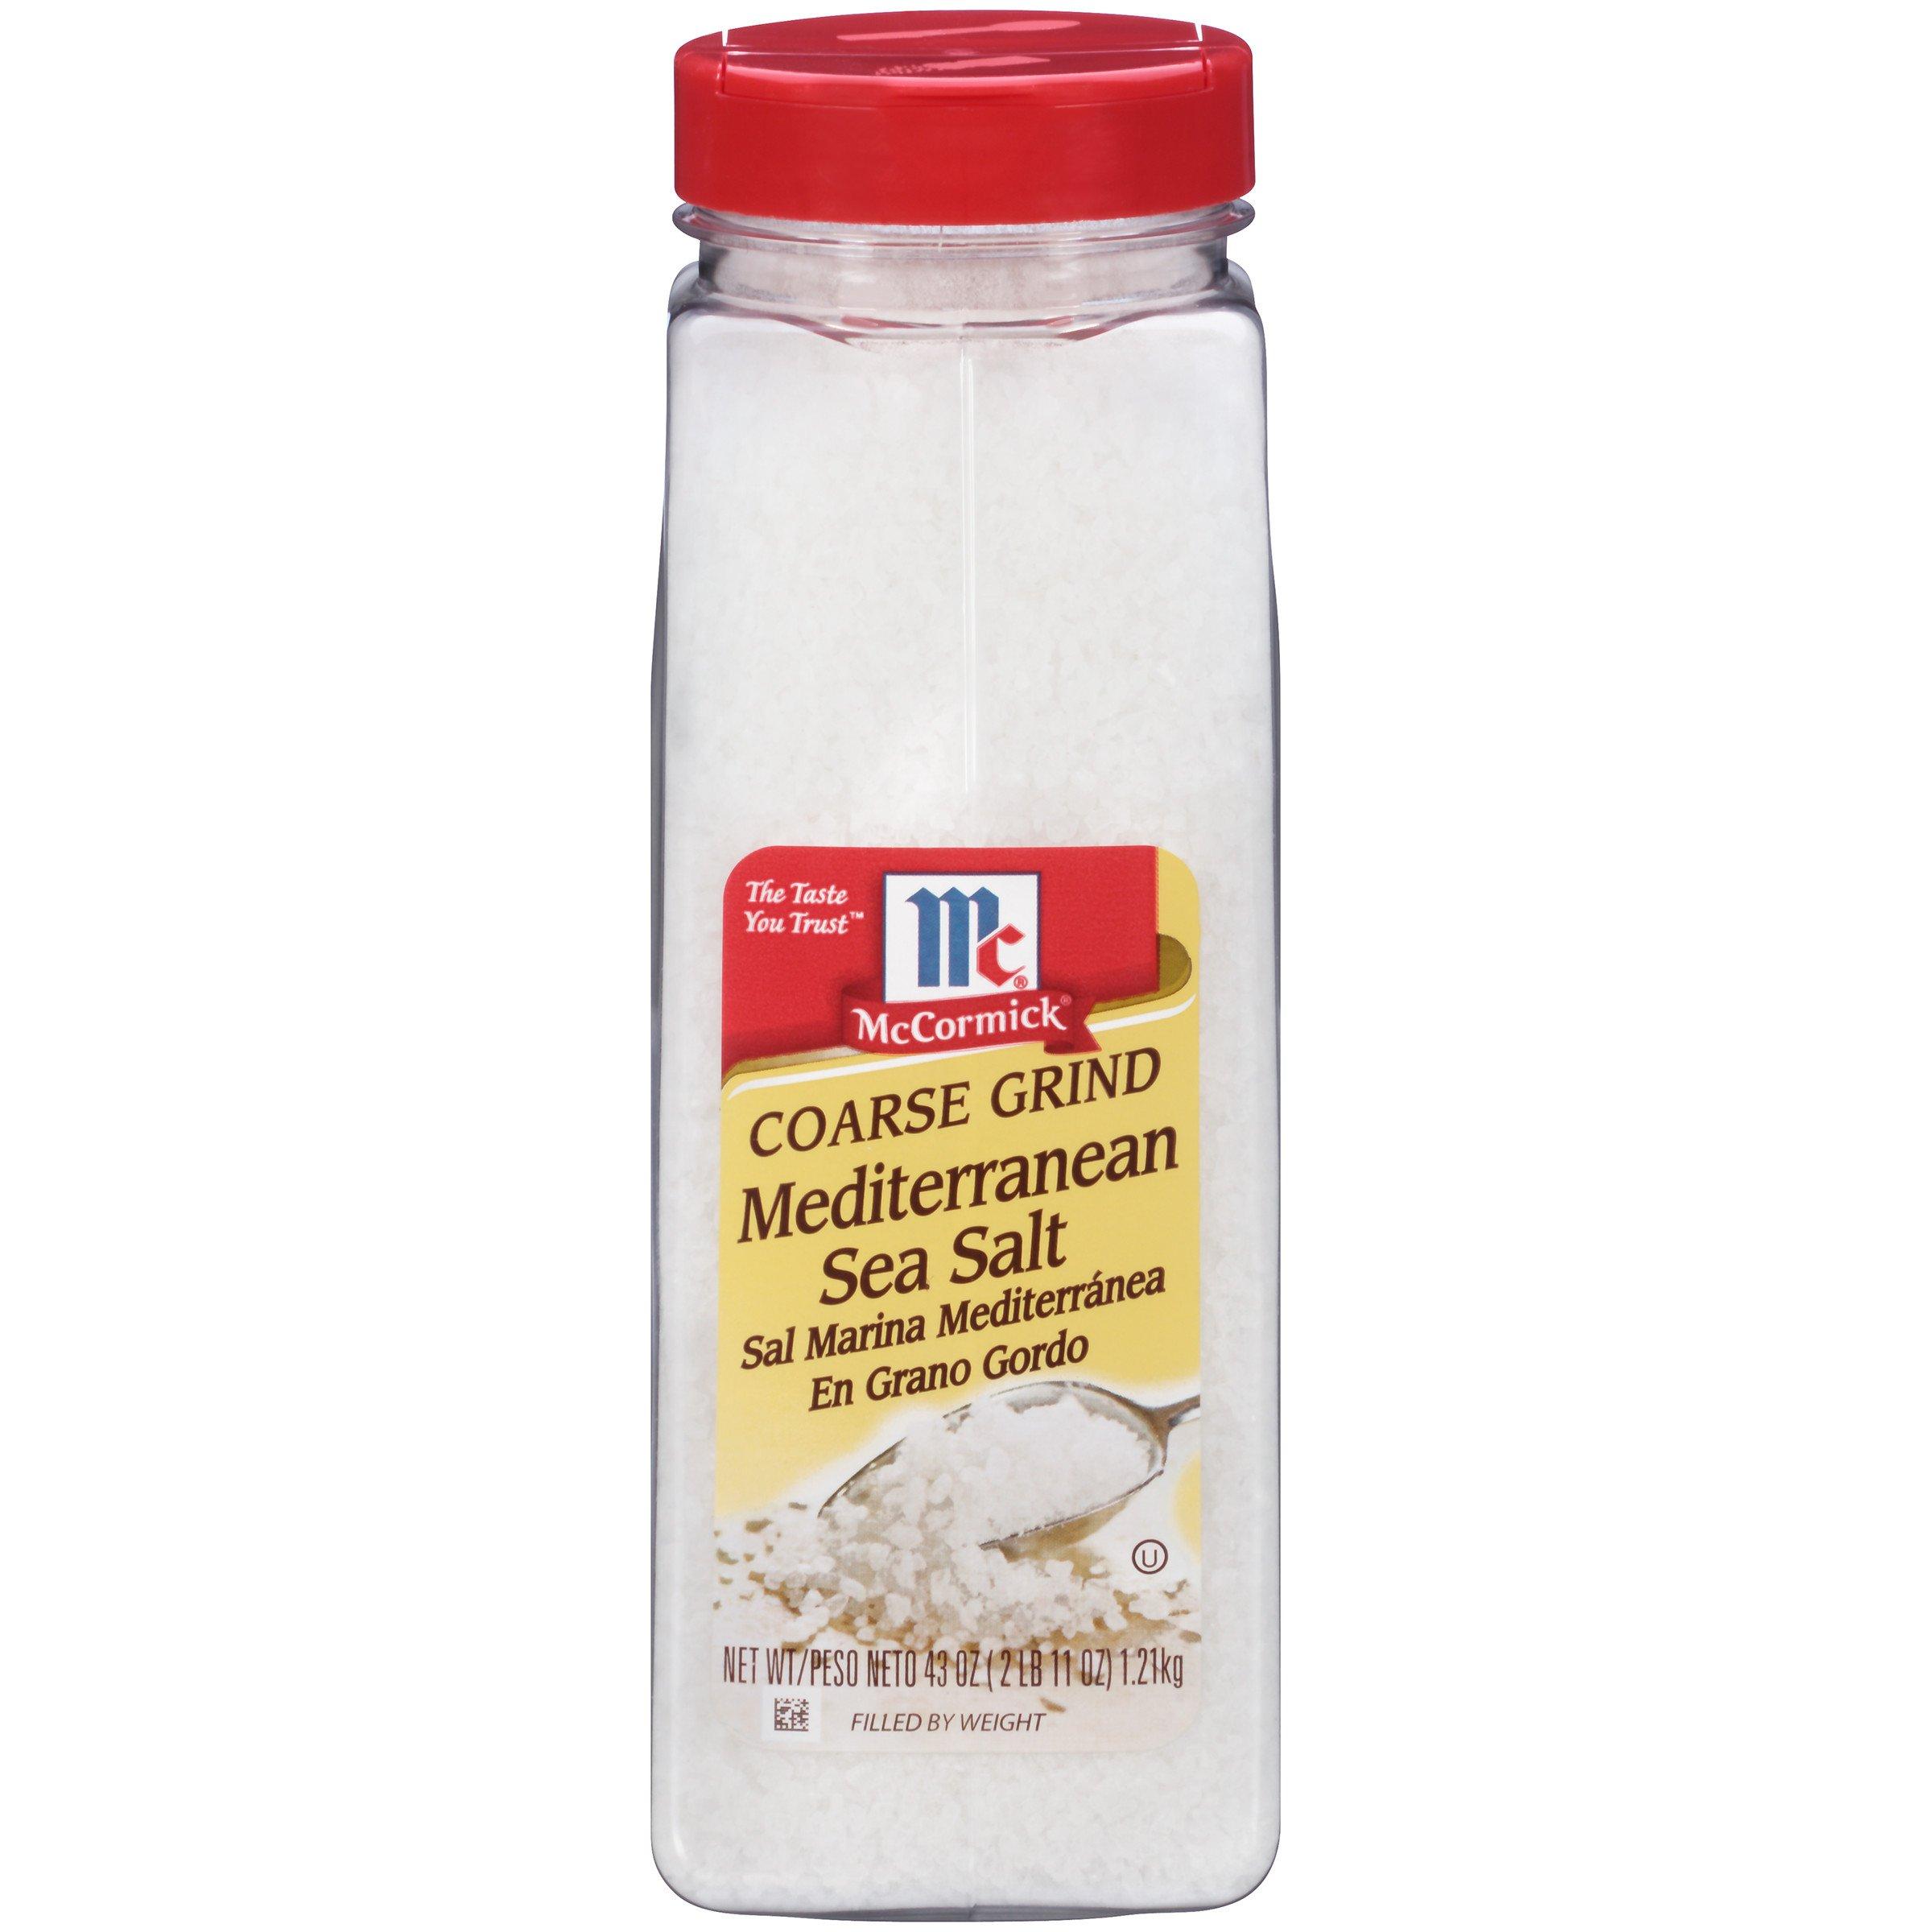 McCormick Coarse Grind Mediterranean Sea Salt, 43 oz